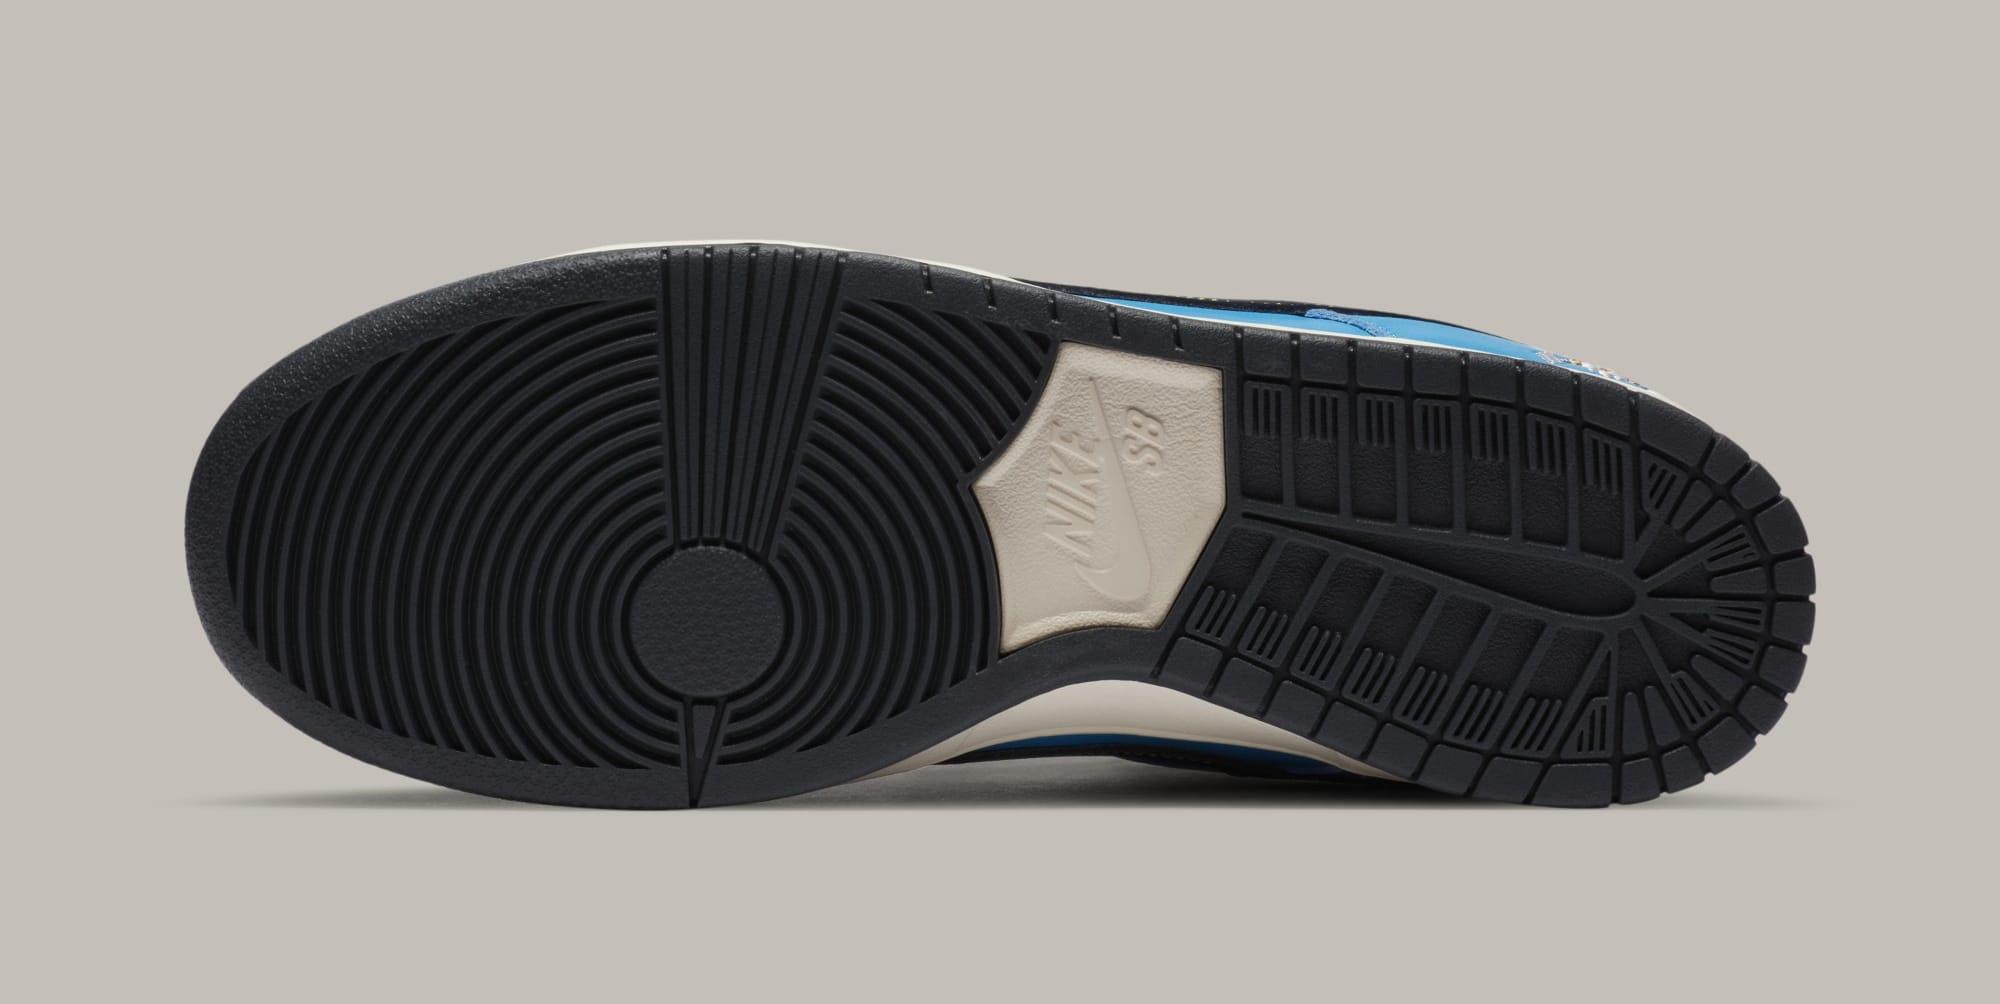 Instant Skateboards x Nike SB Dunk Low CZ5128-400 Outsole